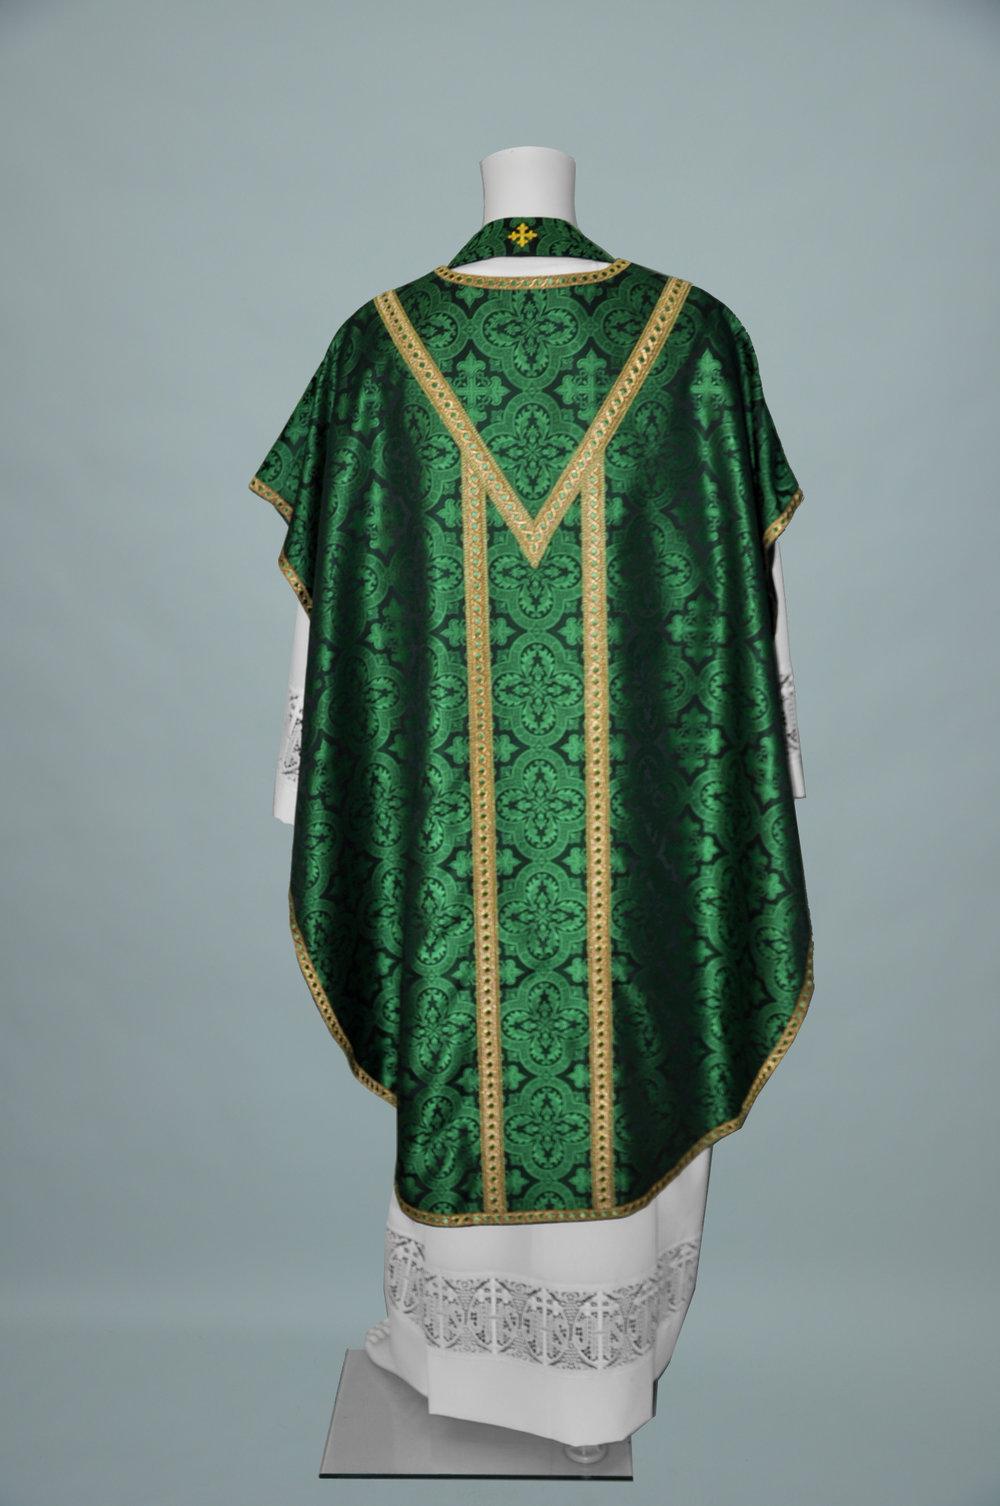 St Philip Neri Davinci Green W 2326 Green gold (b)1.jpg